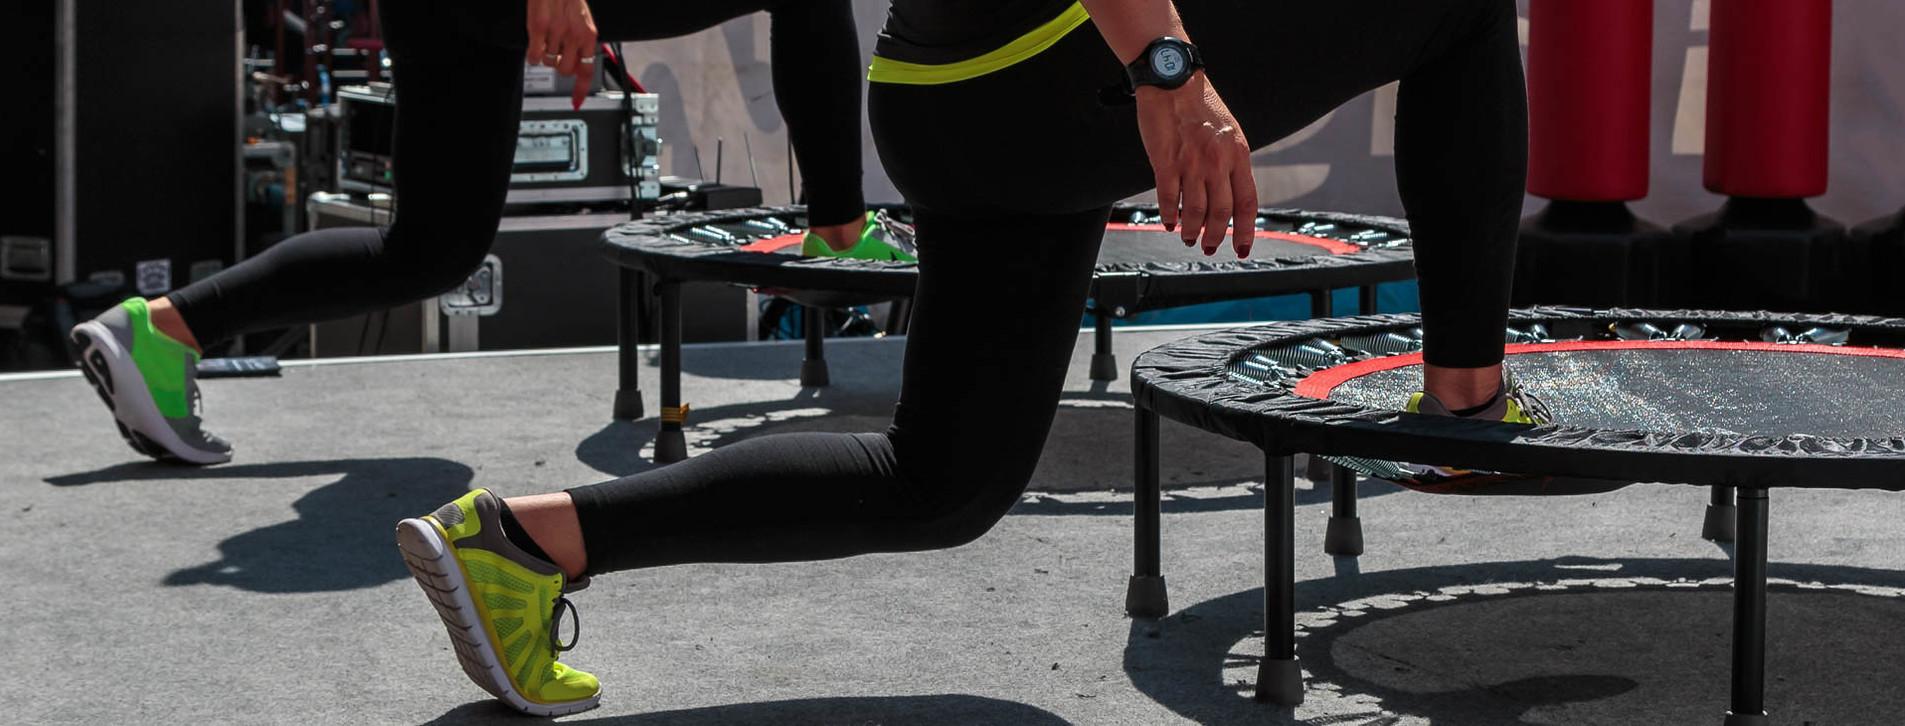 Фото 1 - Джампинг-фитнес на батутах для двоих